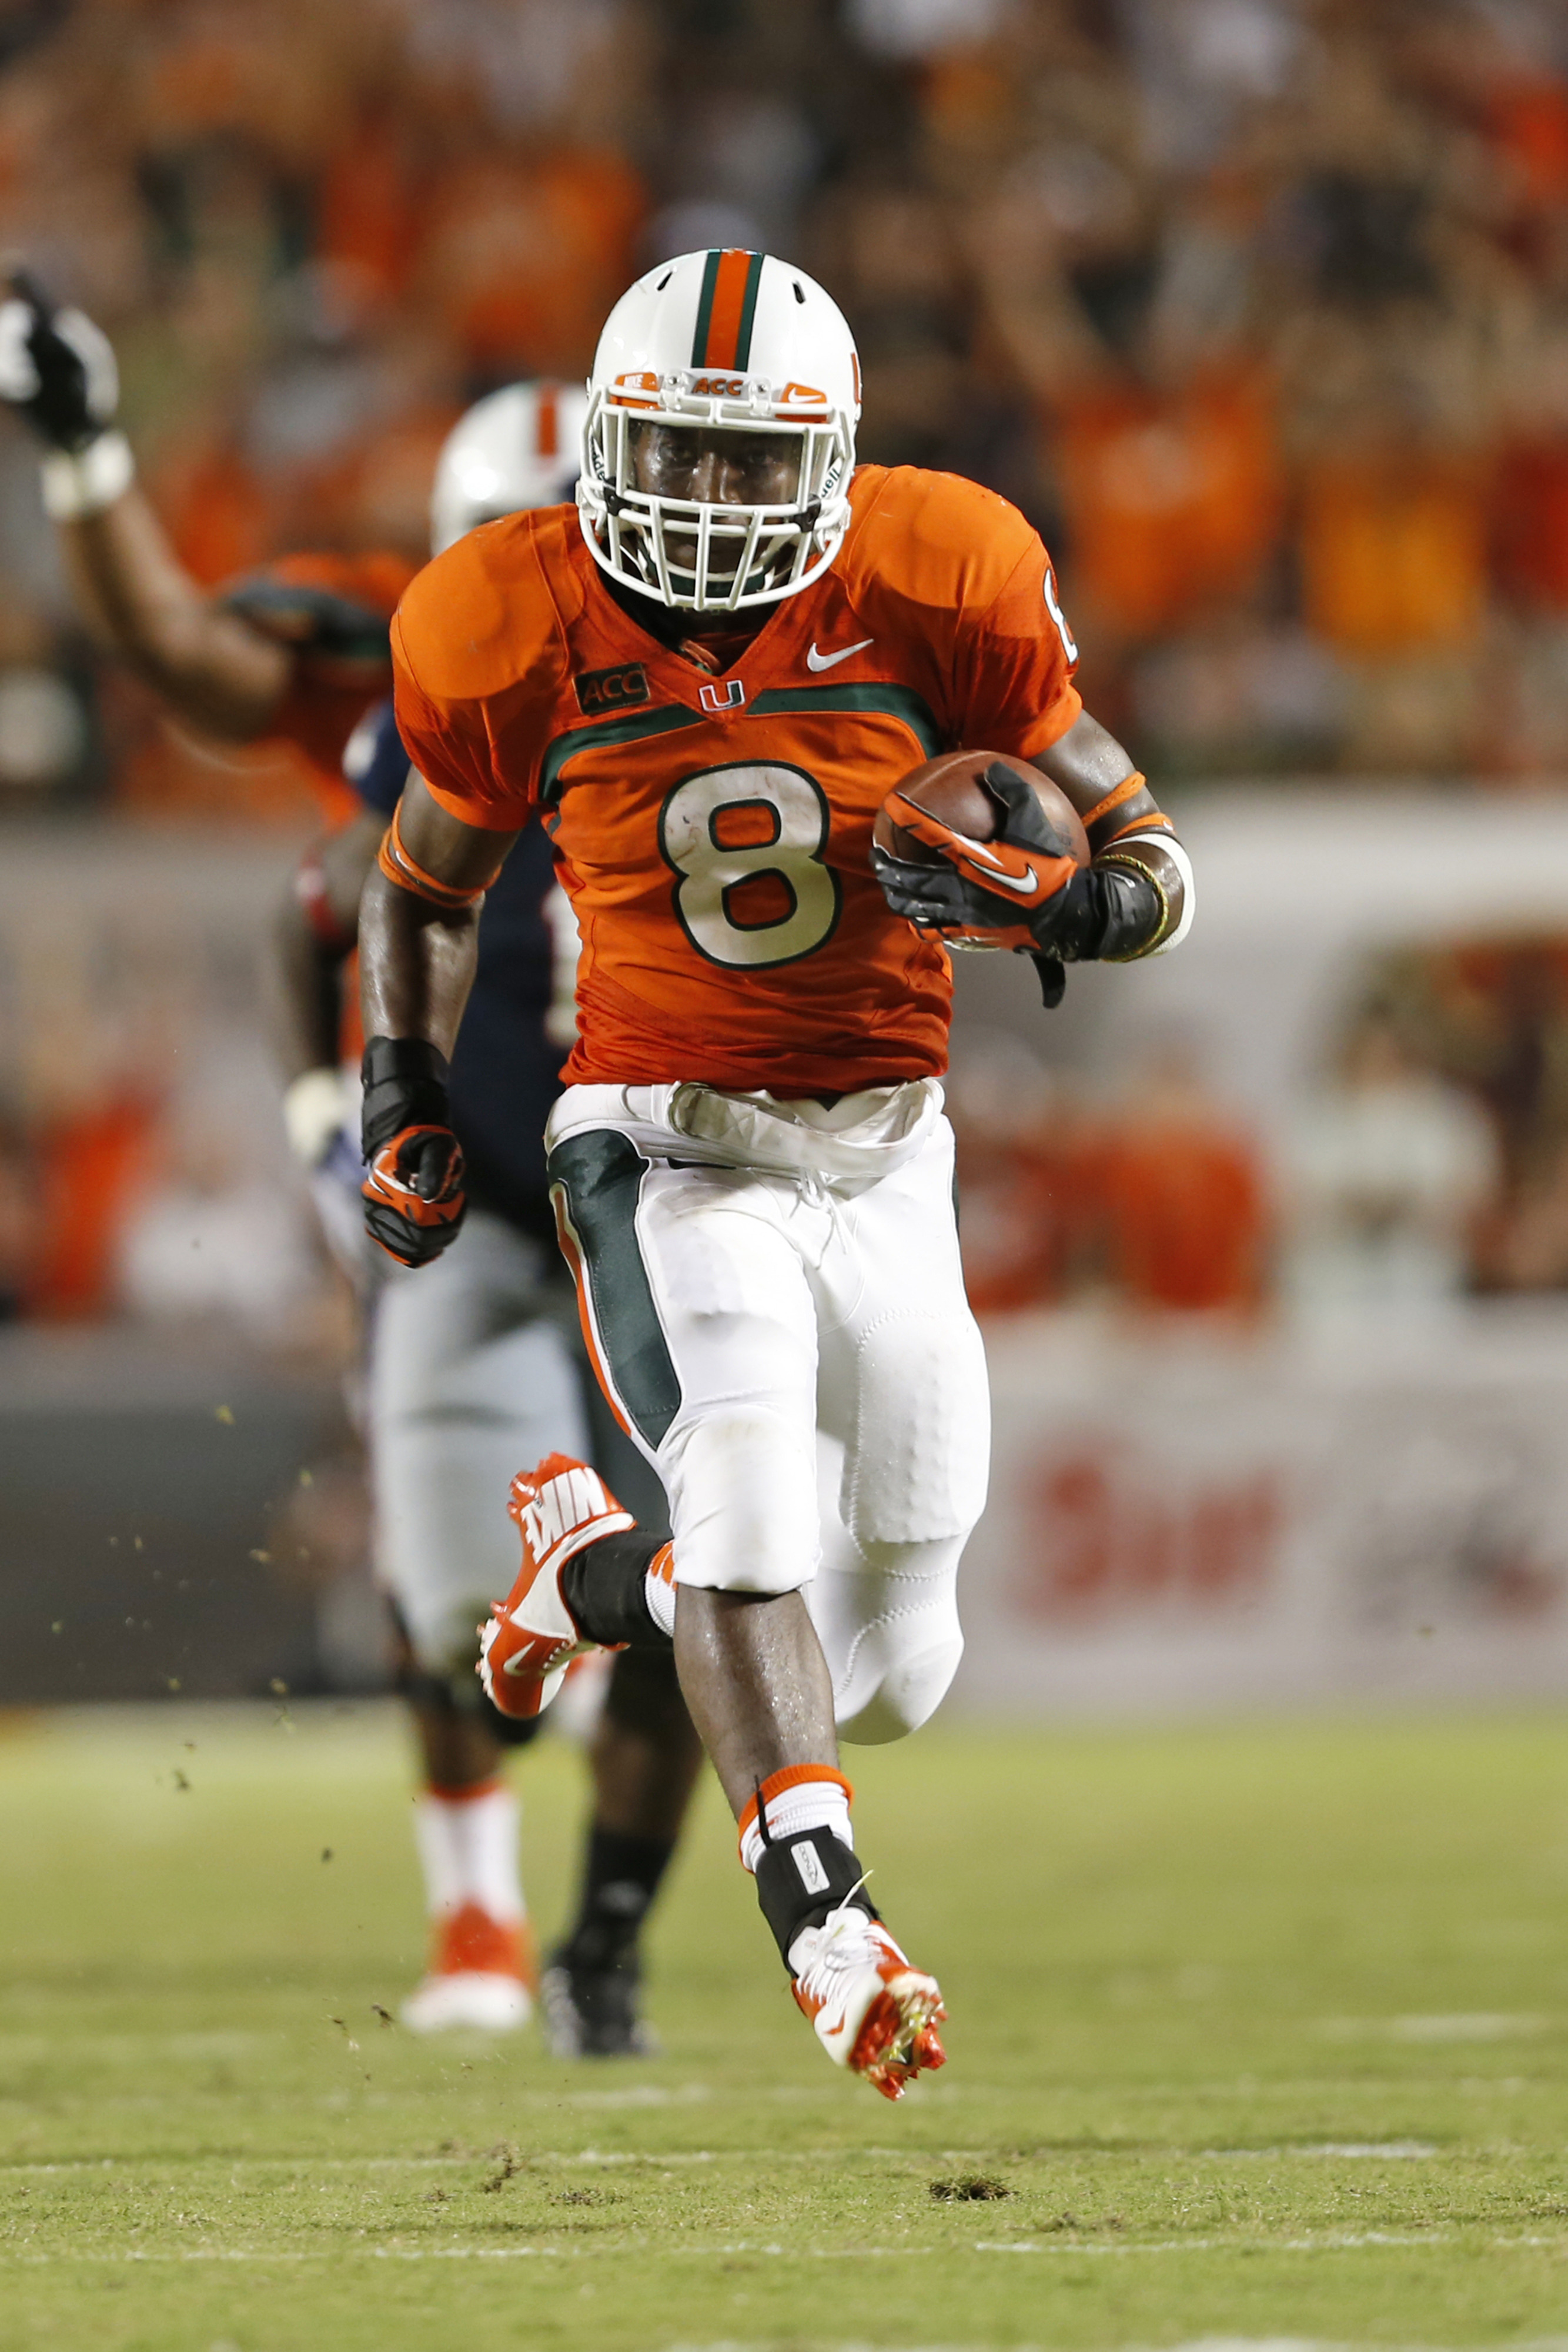 Florida Atlantic vs. Miami 2013 game recap: Duke Johnson leads Hurricanes to a 34-6 victory